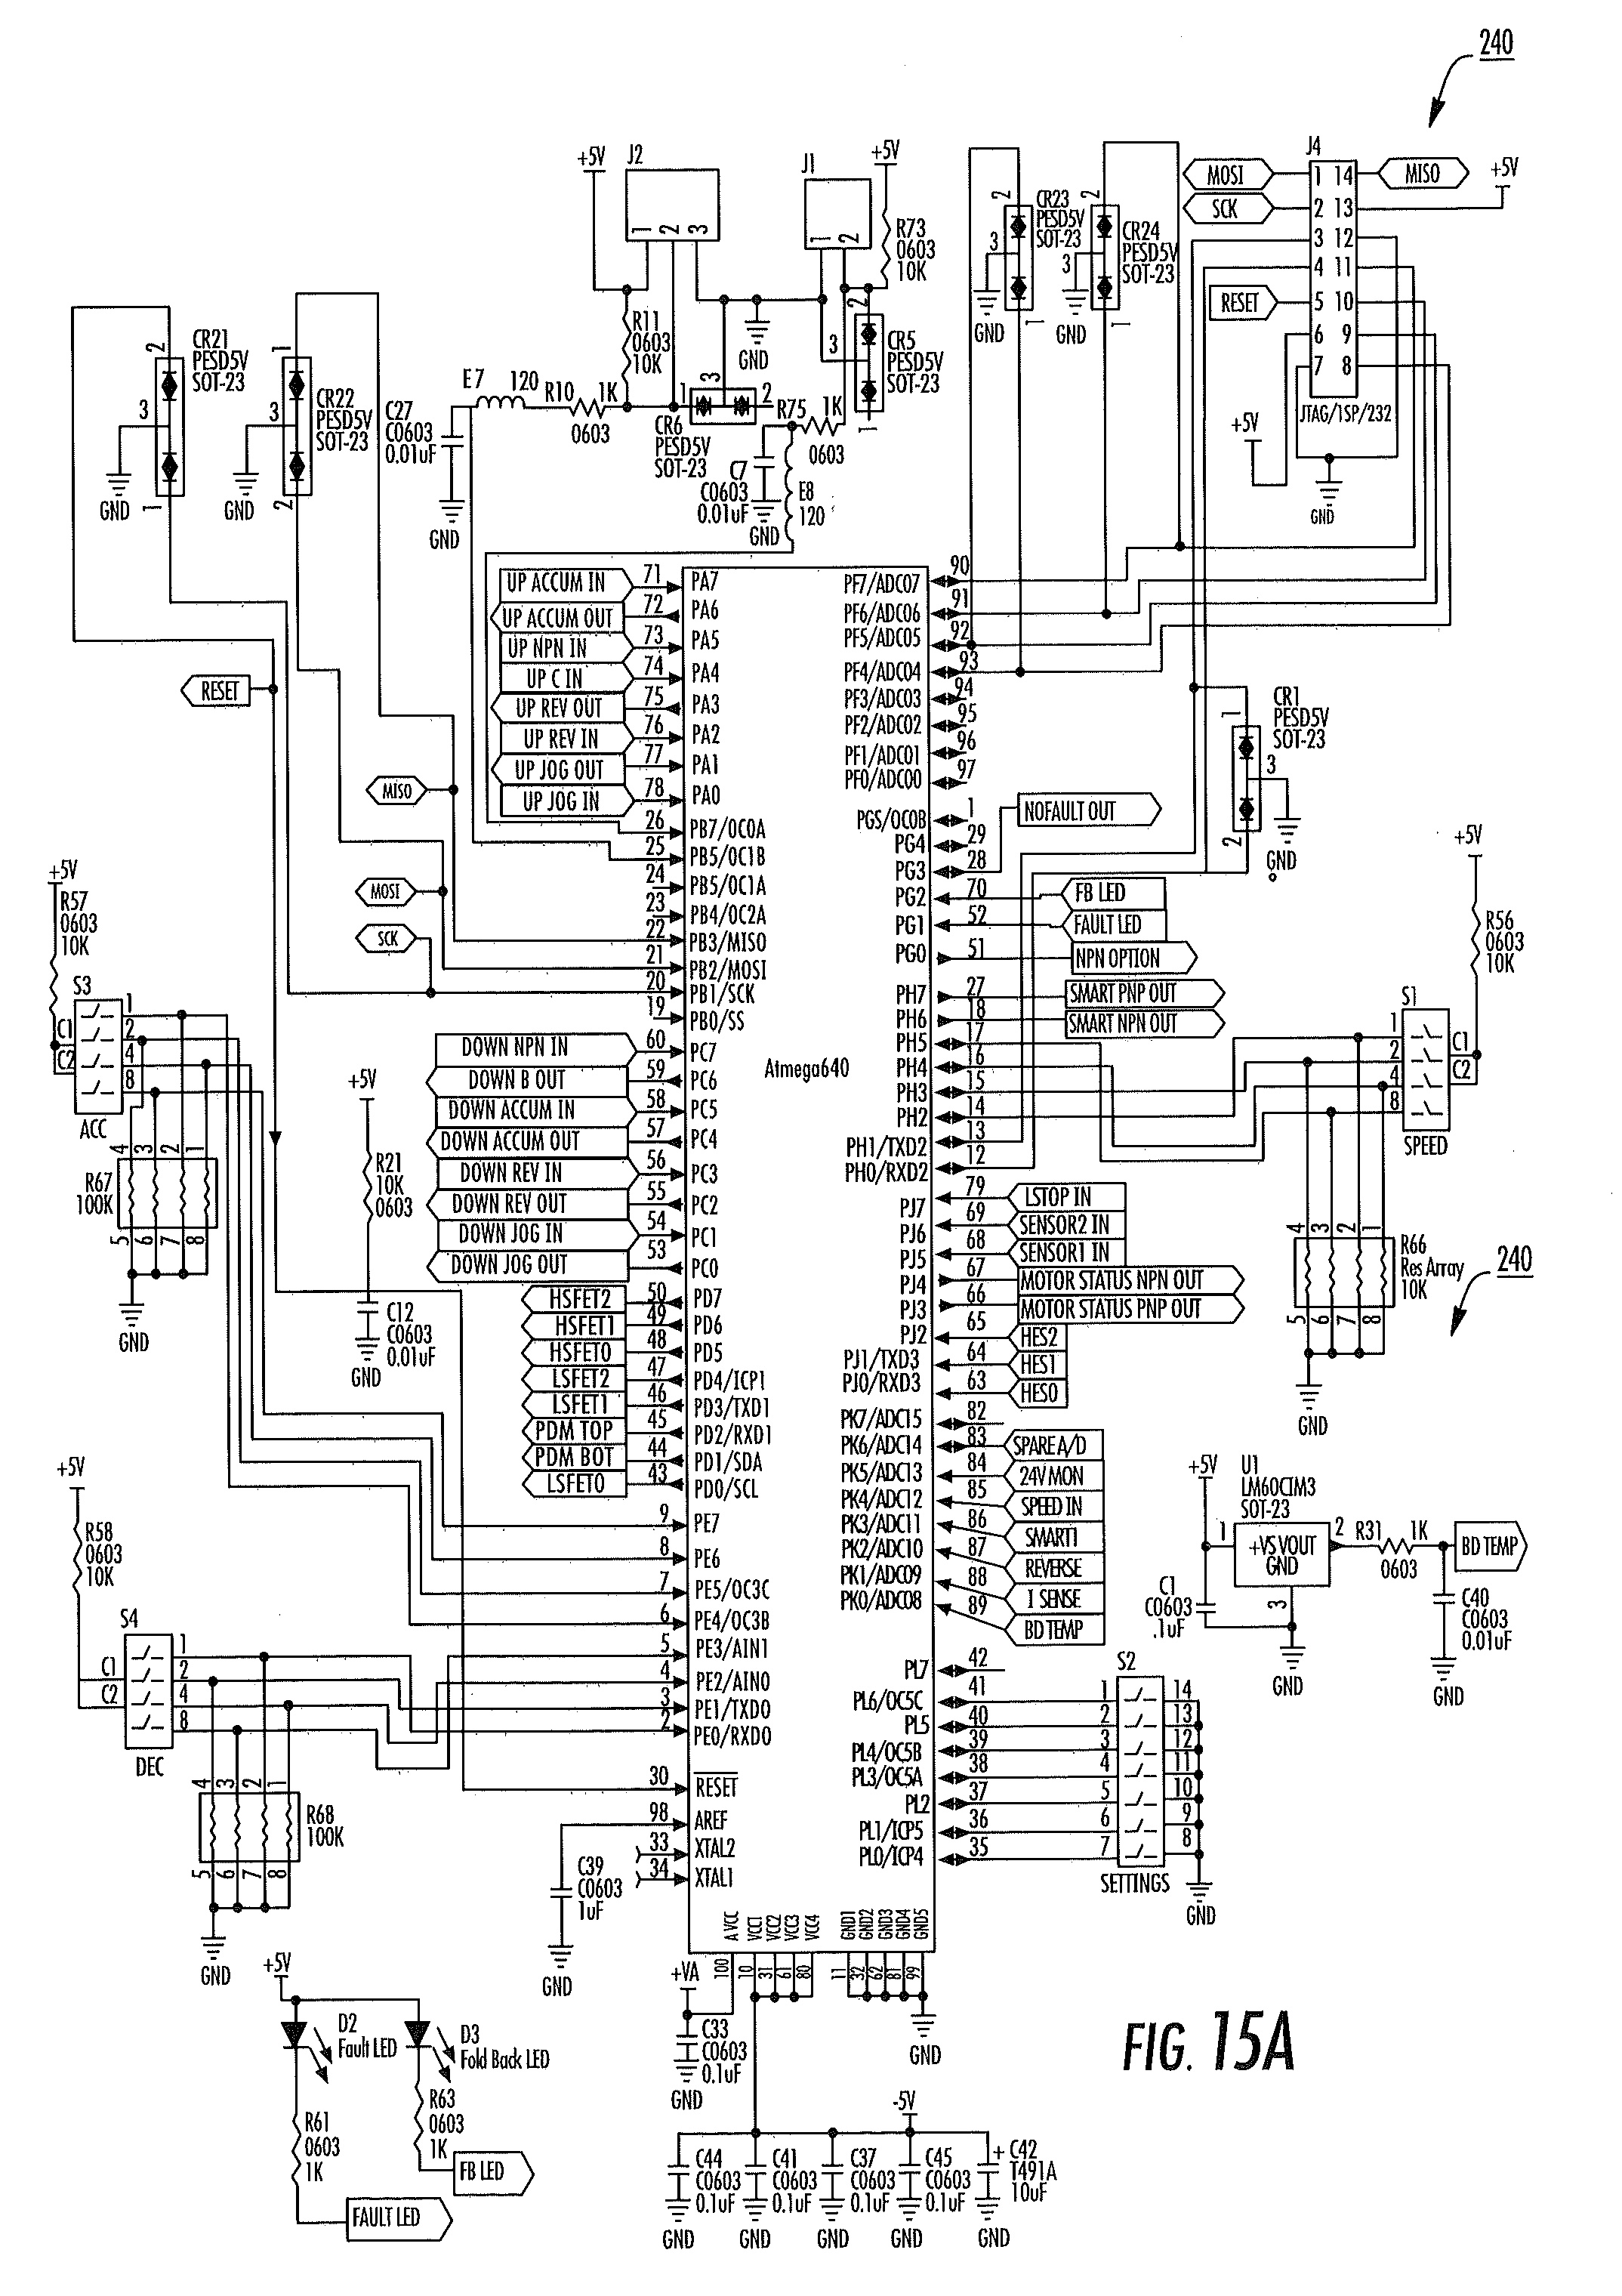 2004 Audi S4 Wire Diagram Com